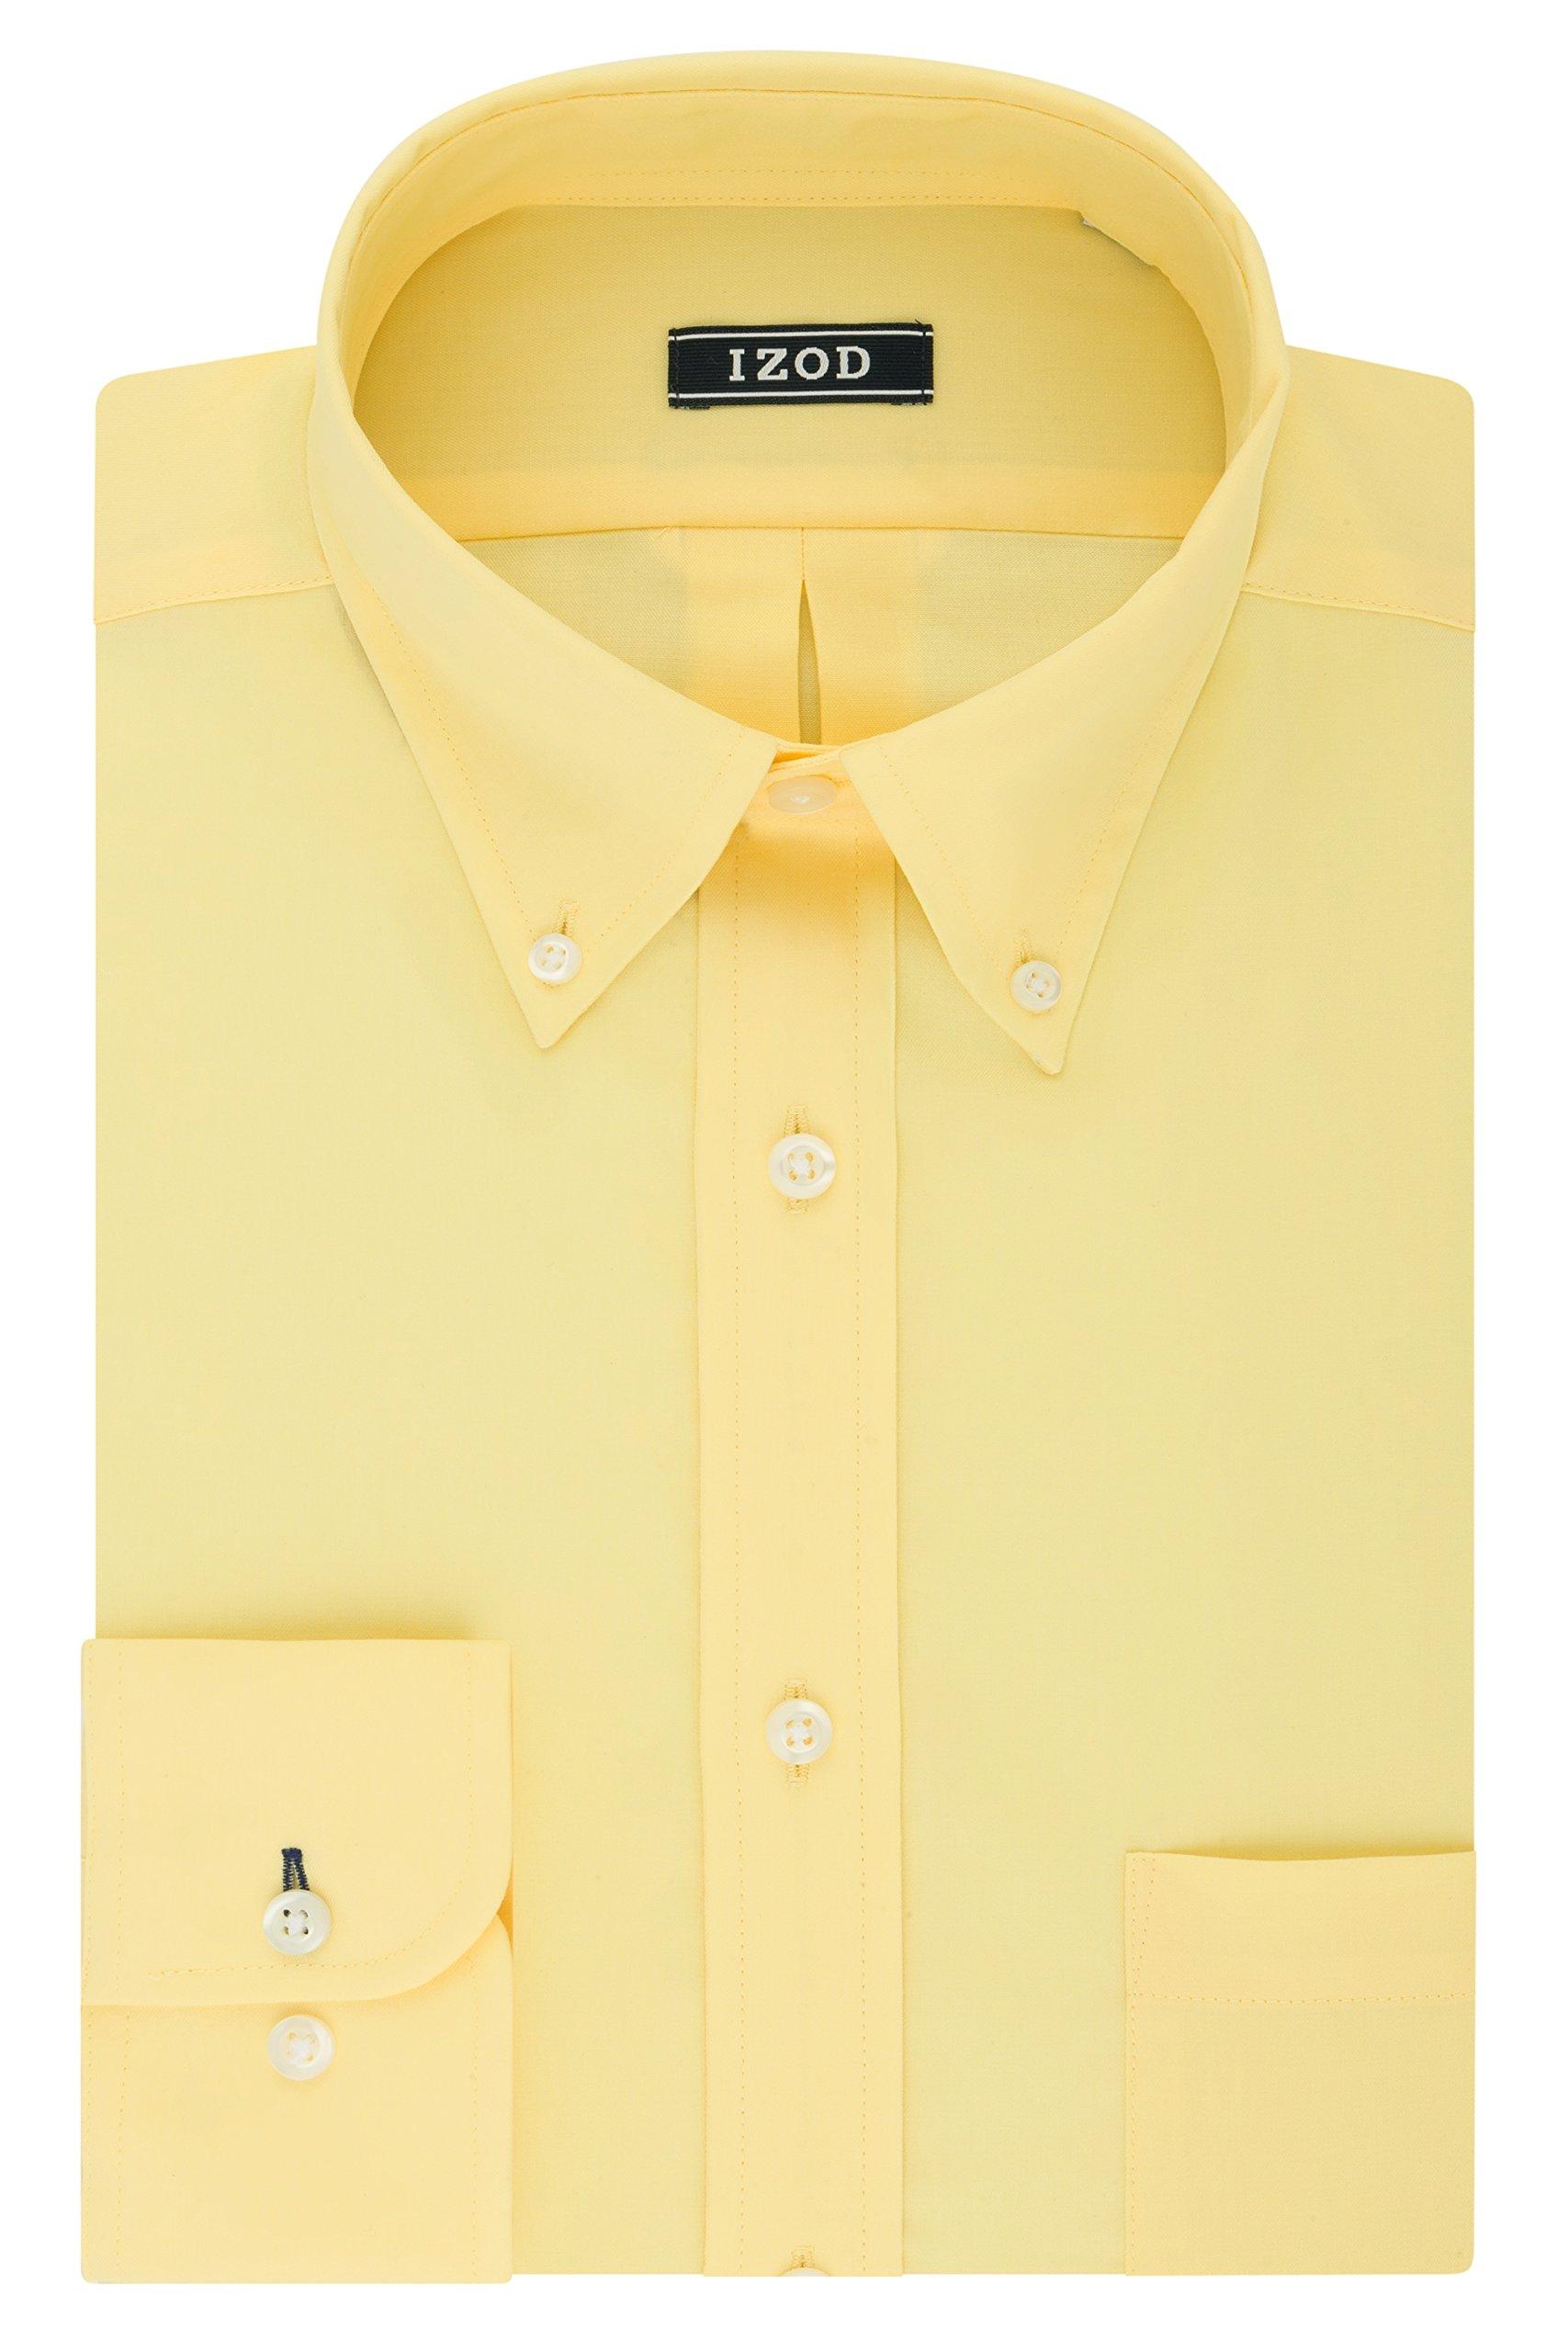 IZOD Men's Regular Fit Stretch Solid Buttondown Collar Dress Shirt, Yellow, 15''-15.5'' Neck 32''-33'' Sleeve